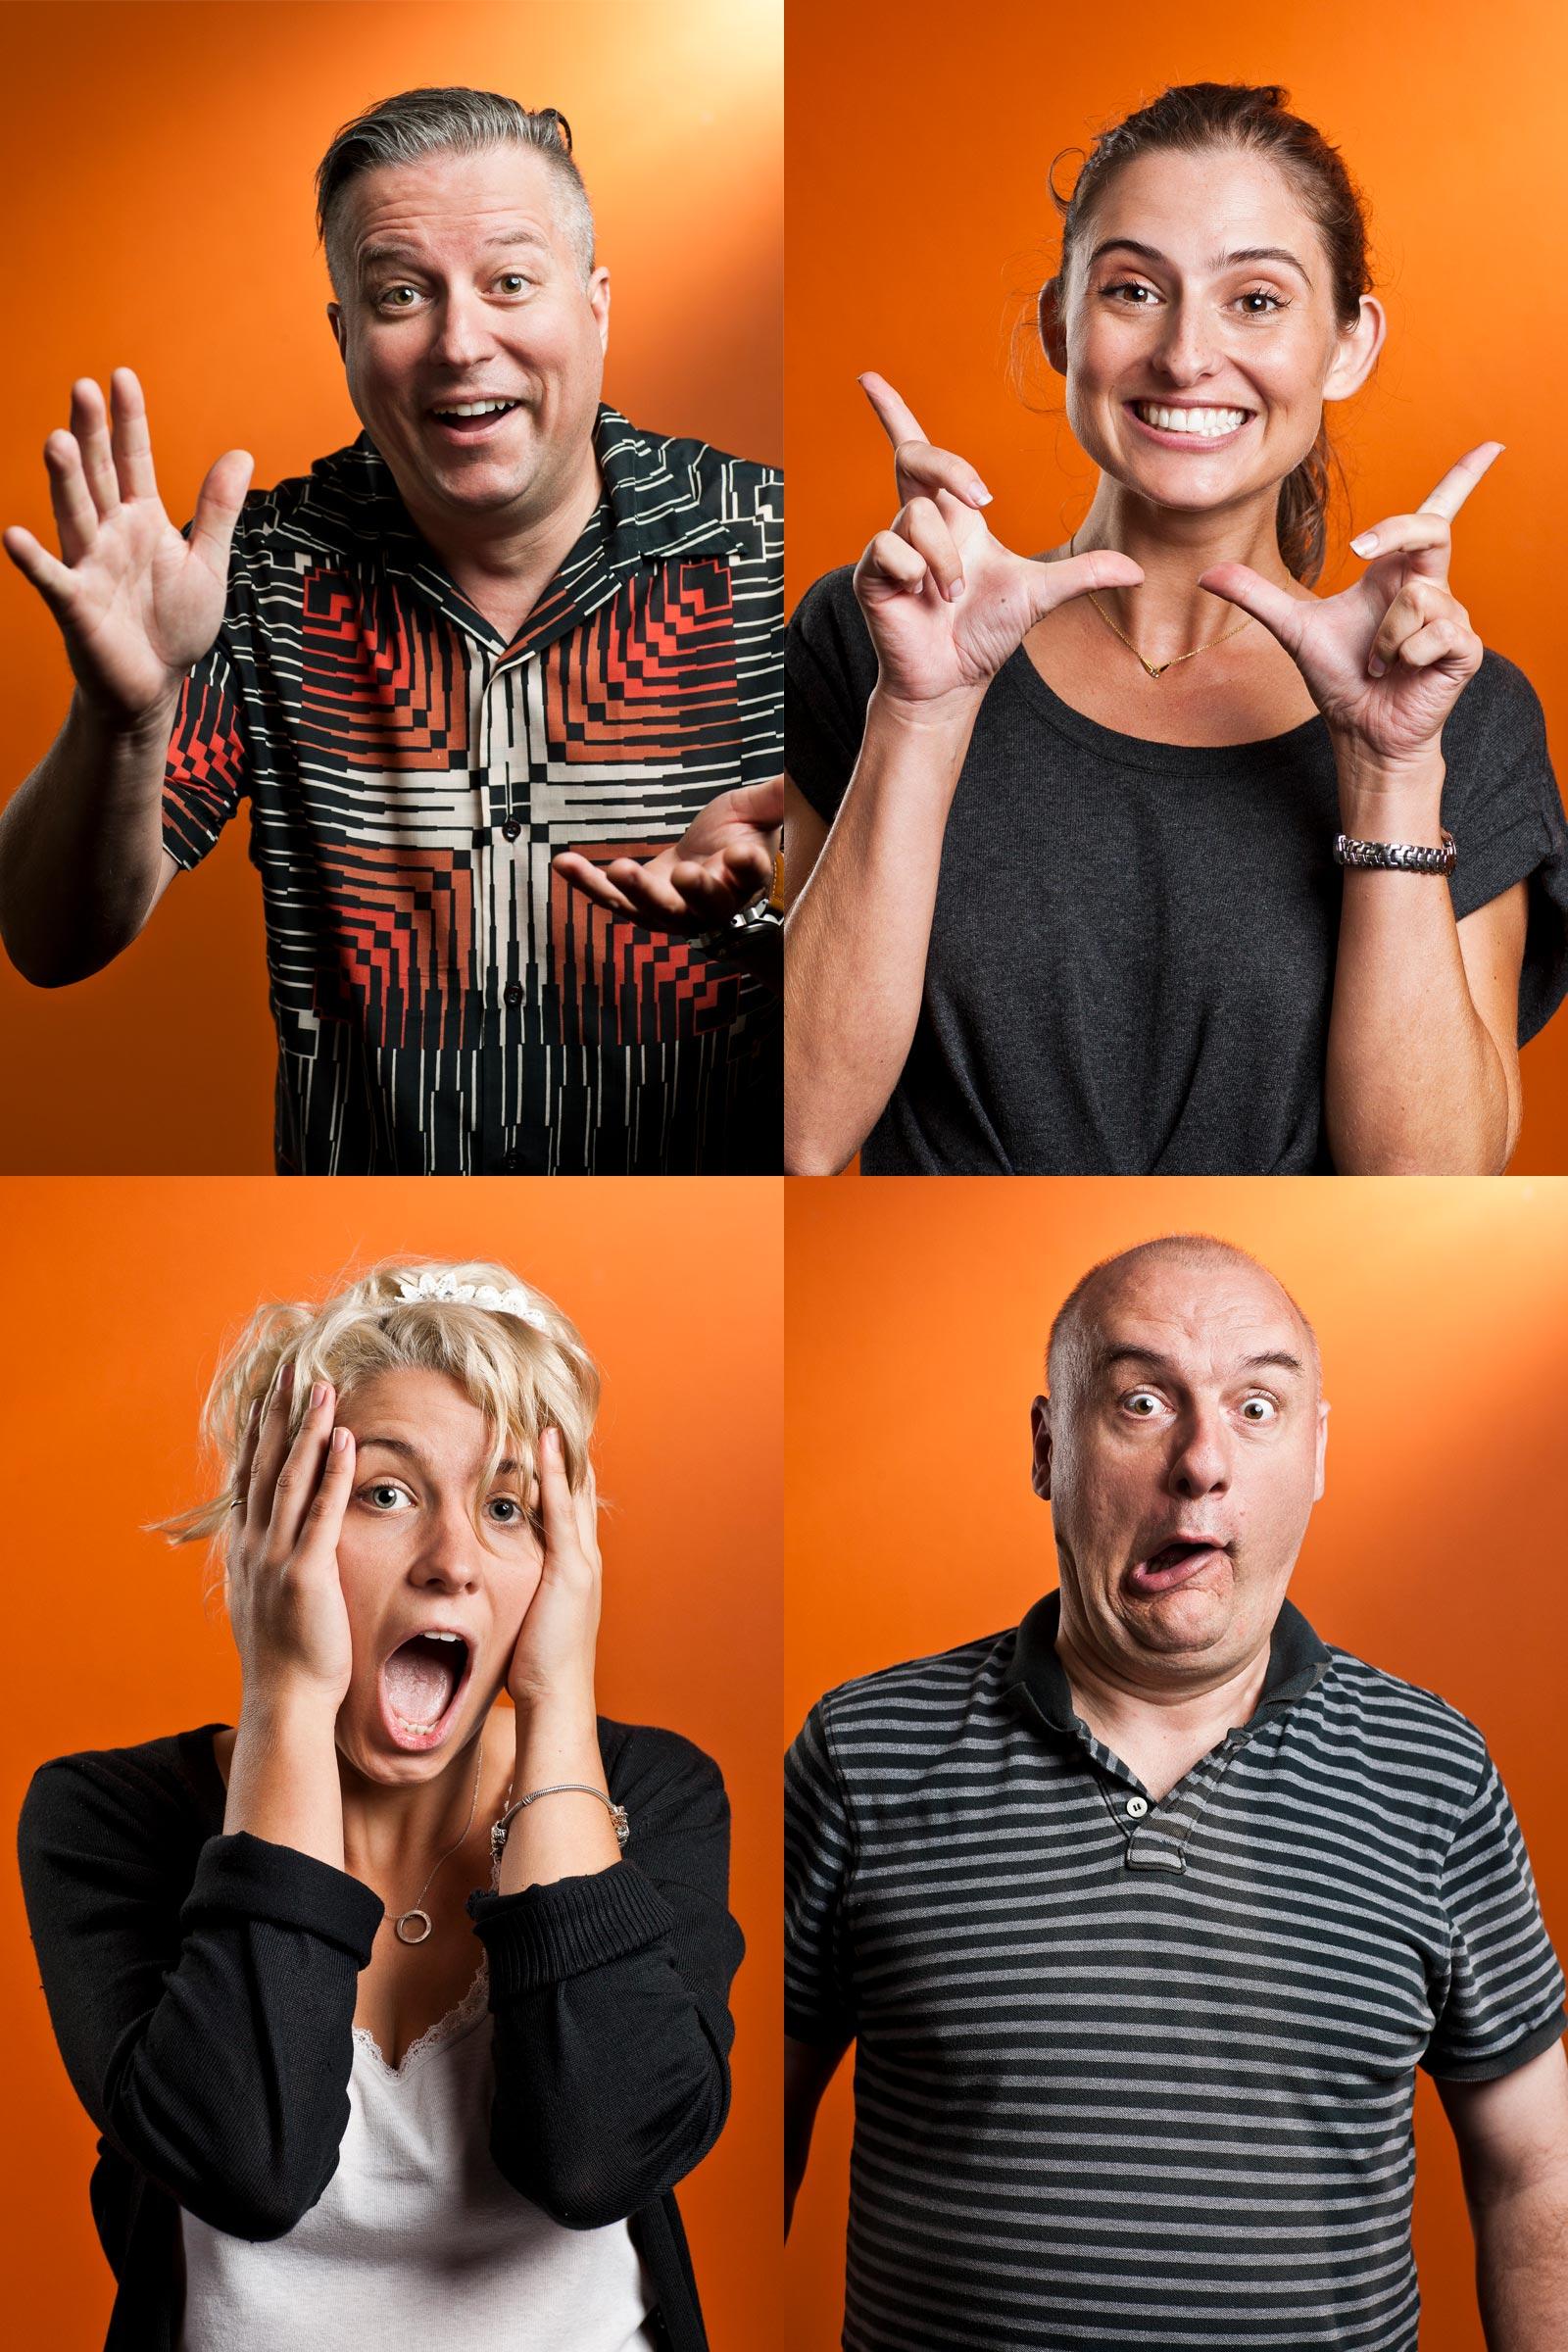 Corporate location portrait creative photography 2 male 2 female making faces orange background